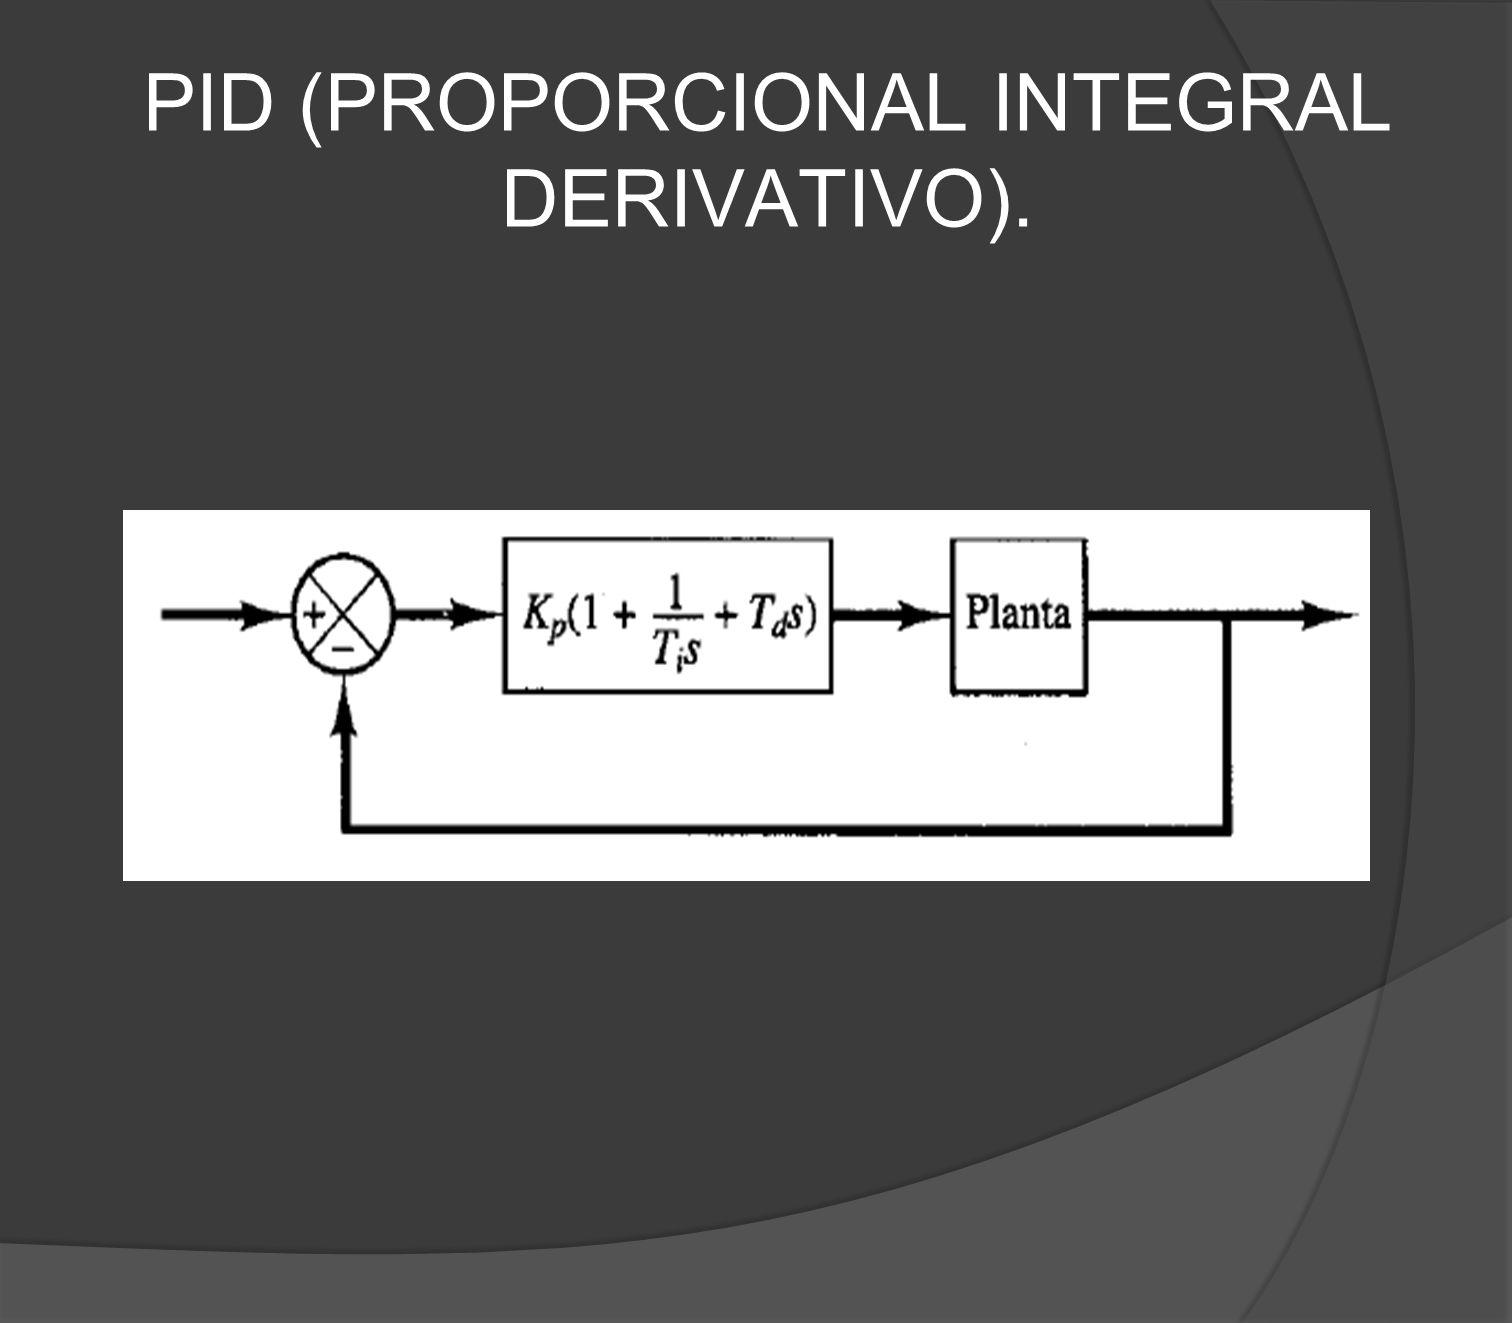 PID (PROPORCIONAL INTEGRAL DERIVATIVO).